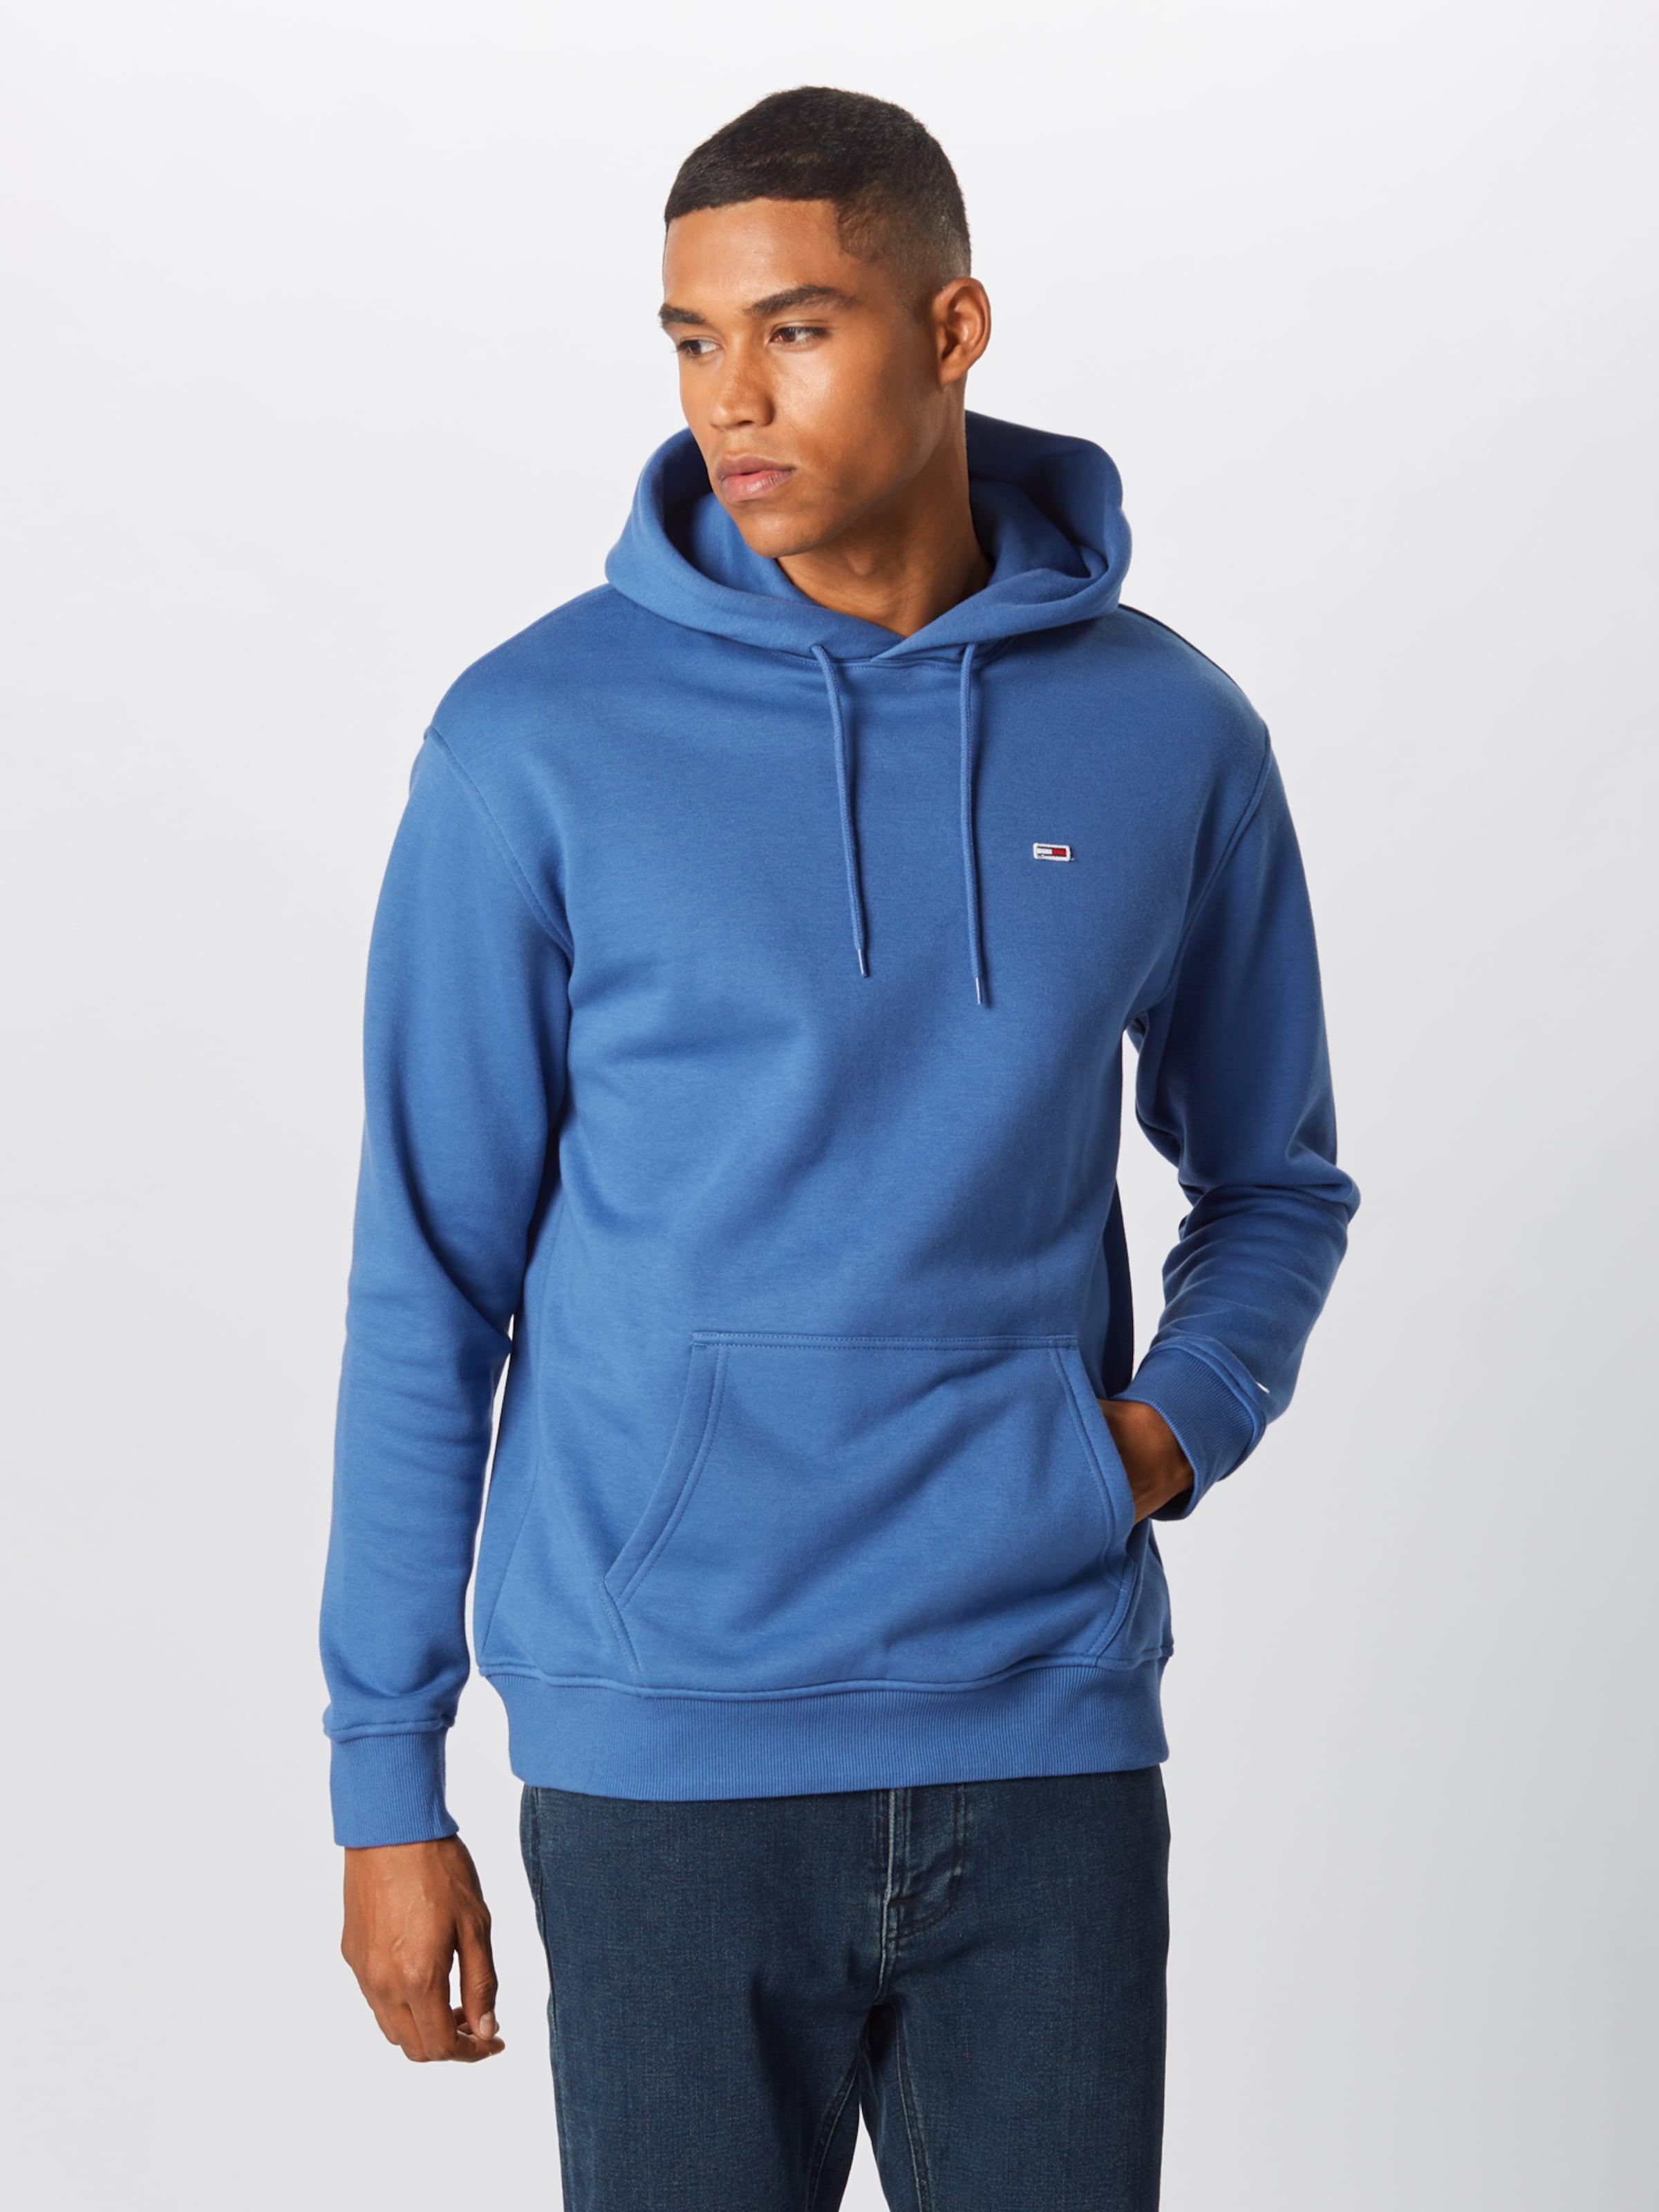 Classics Sweatshirt Tommy Blau 'tommy Jeans Hoodie' In UGMqSzVp